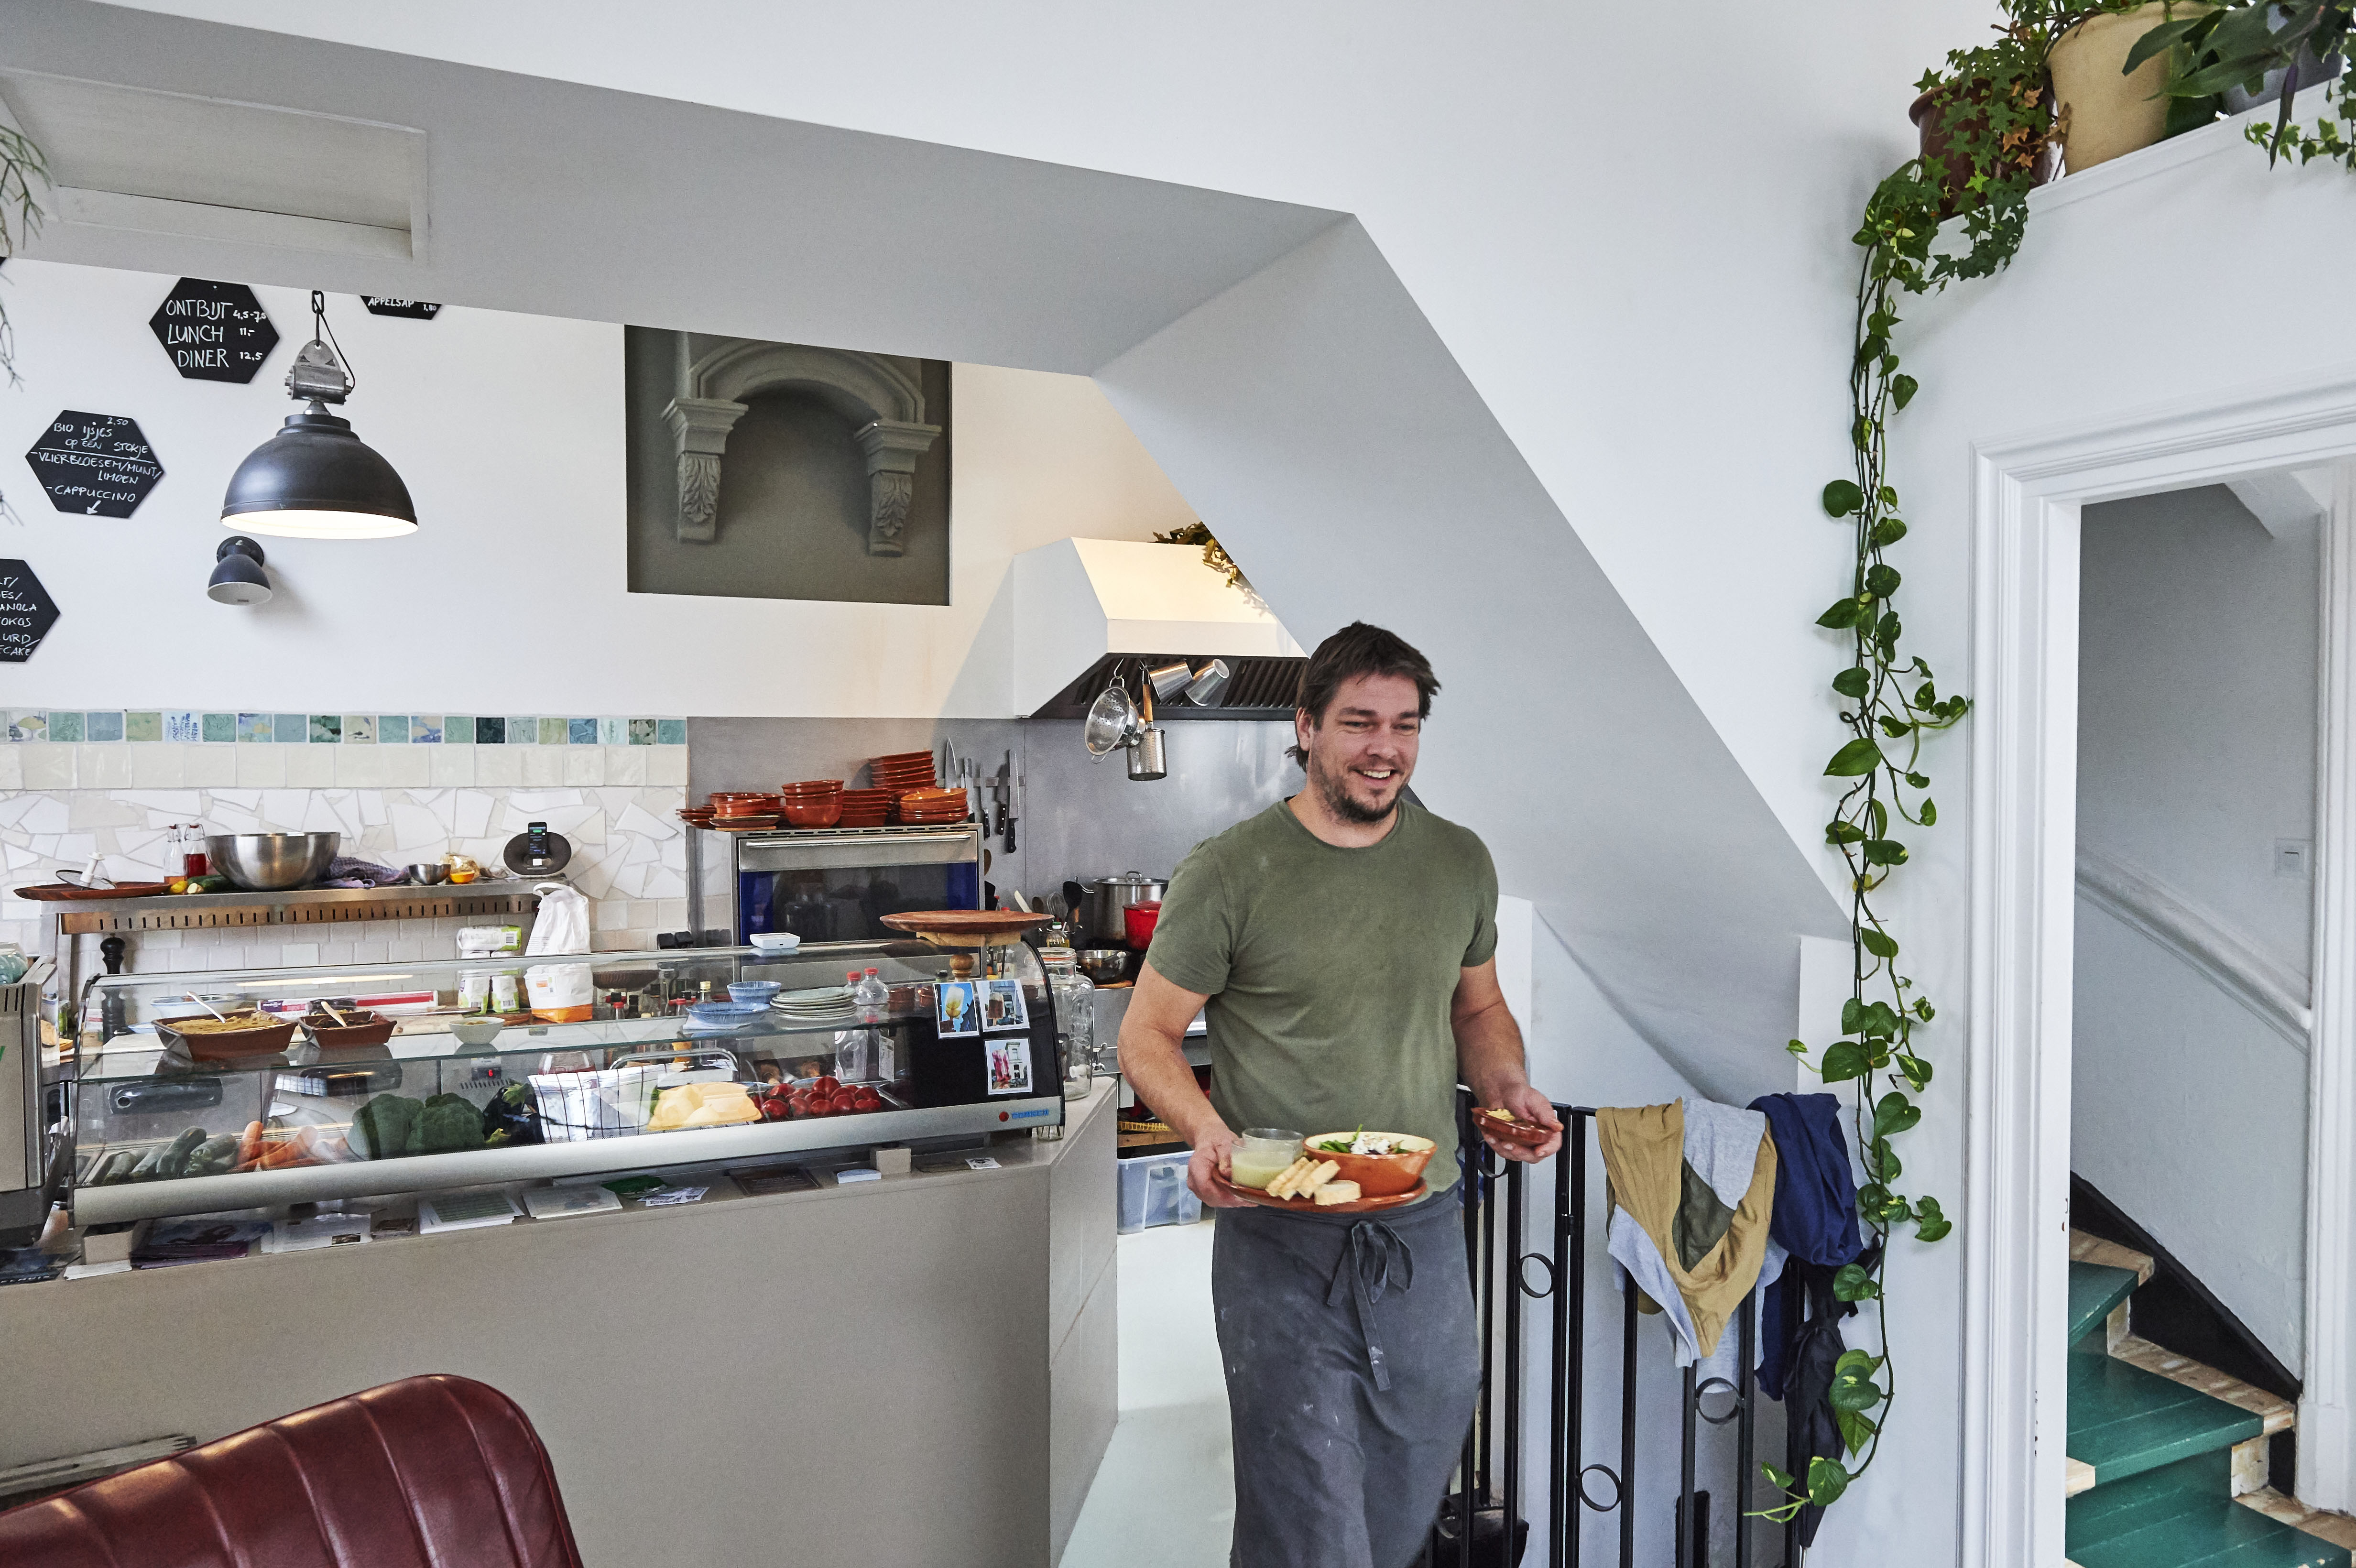 Ondernemer en kok Nick Luken